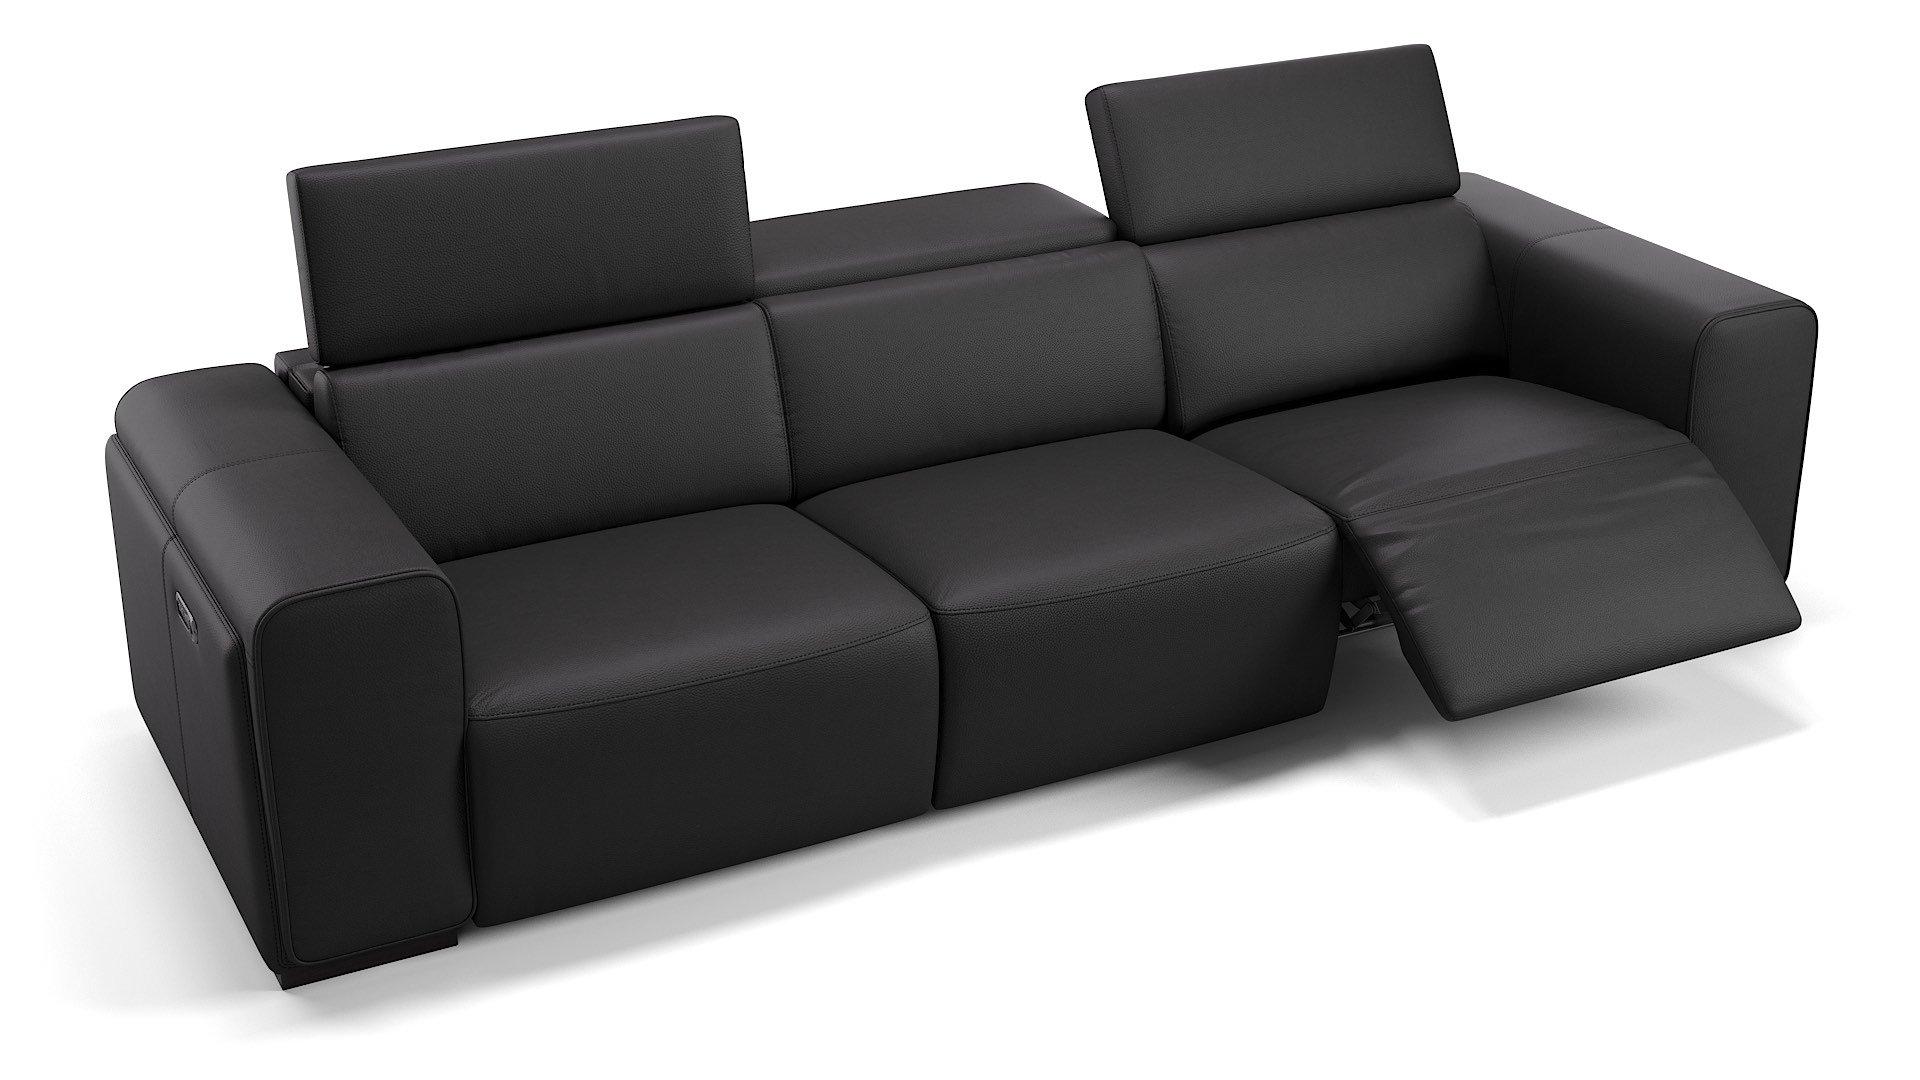 Leder 3-Sitzer Sofa XXL IMPERIA